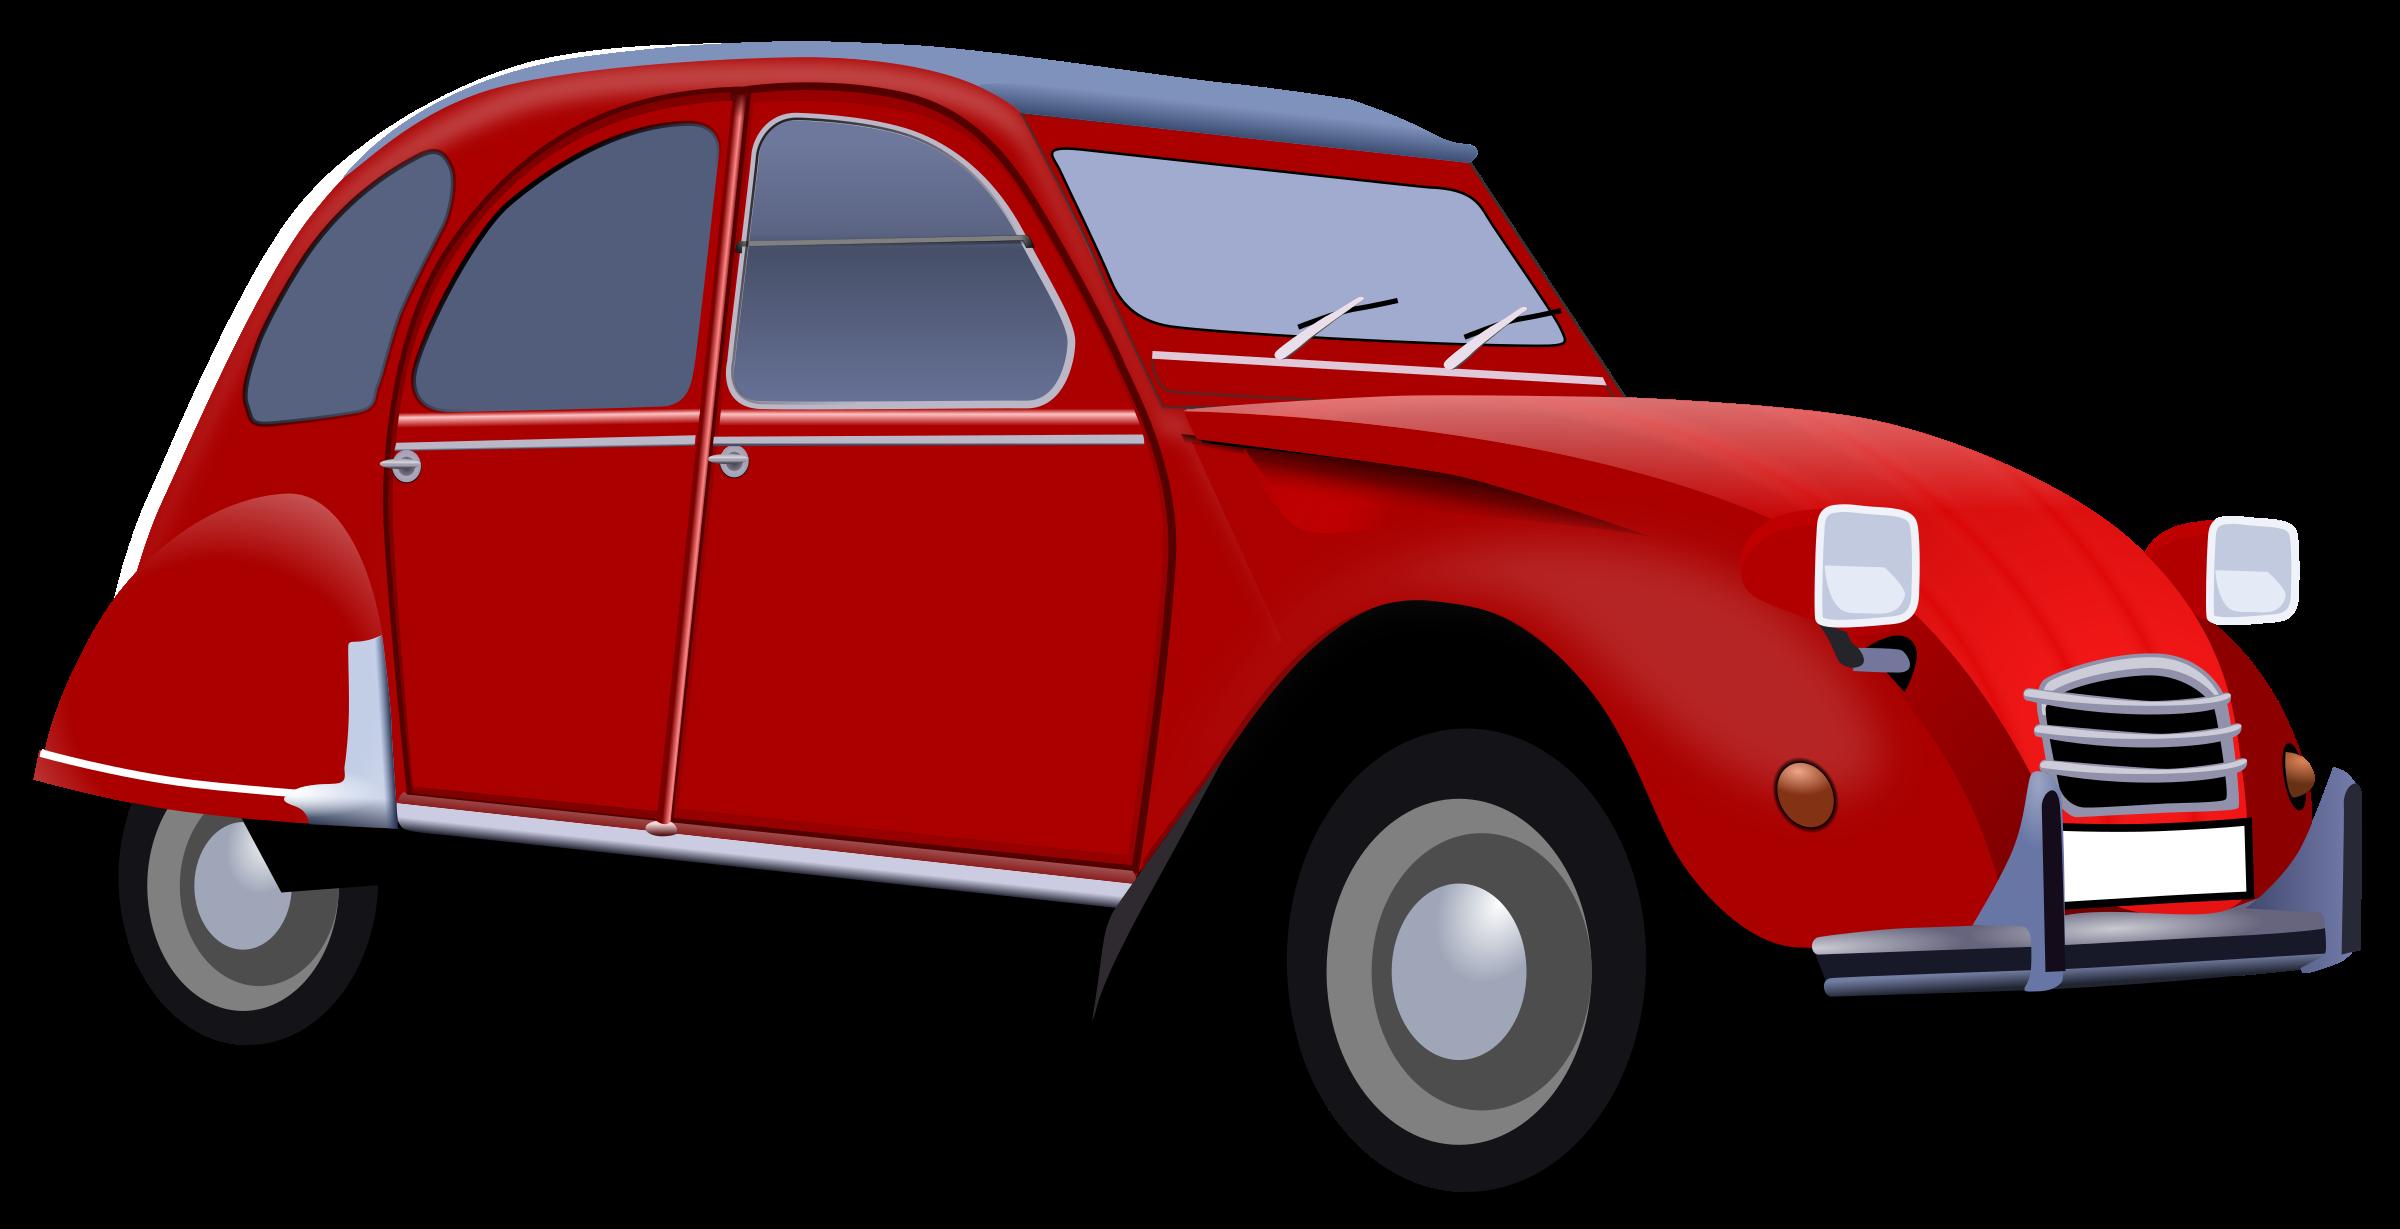 Futuristic car clipart svg download Clipart - 2cv4 Automobile Car svg download